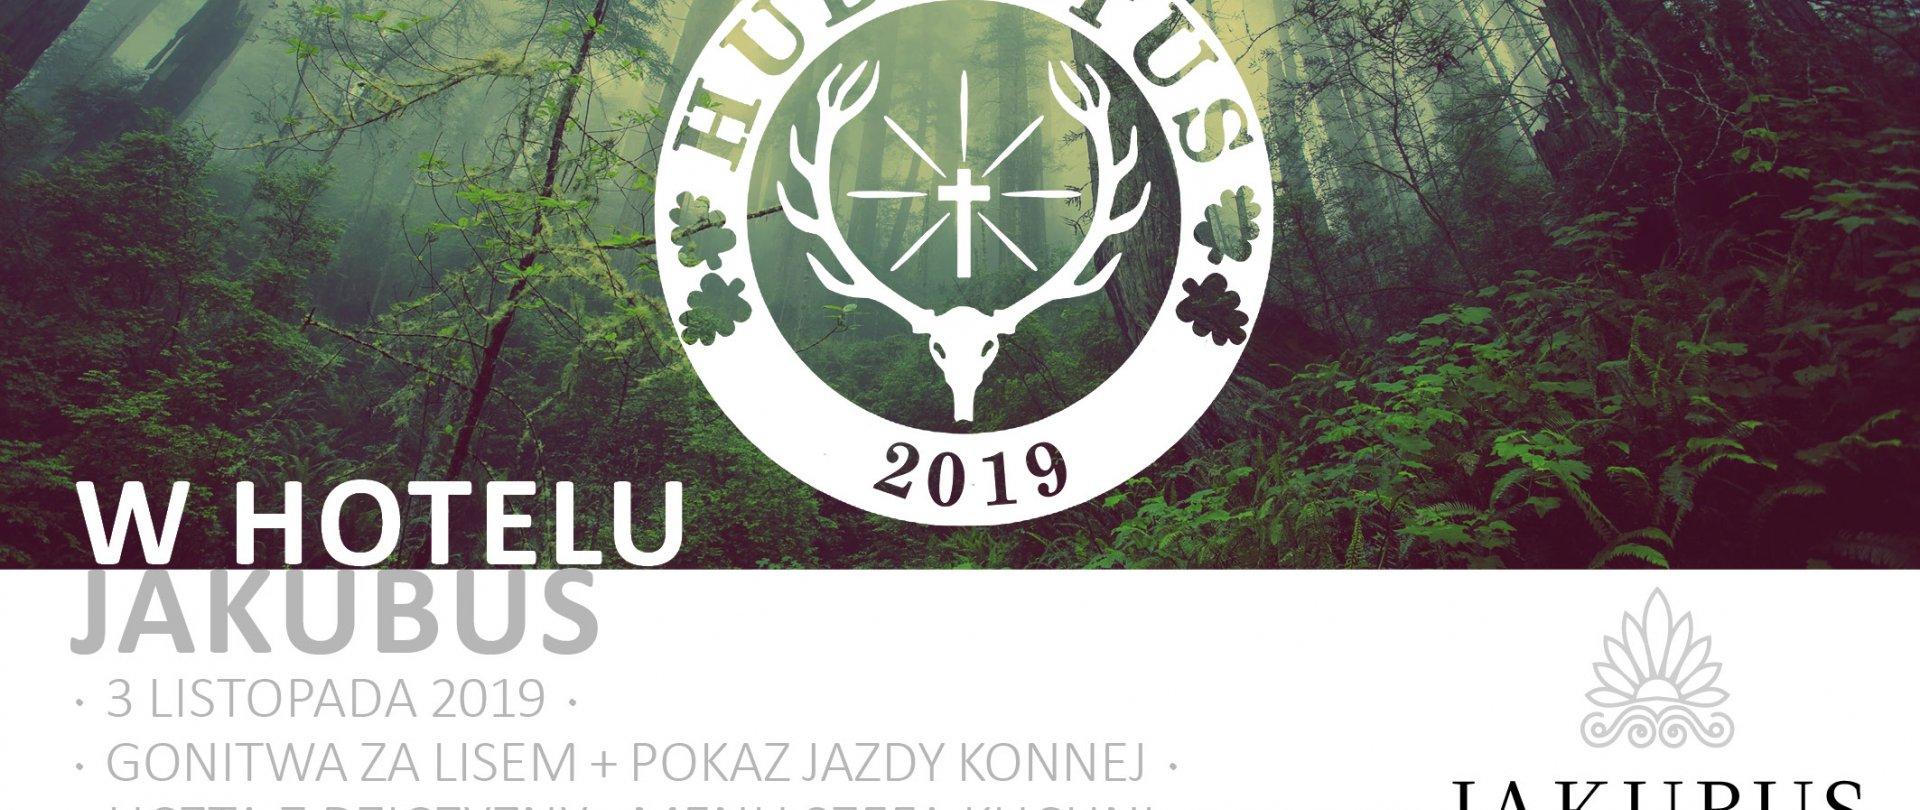 Festiwal Kuchni Myśliwskiej - Hubertus 3.11.2019